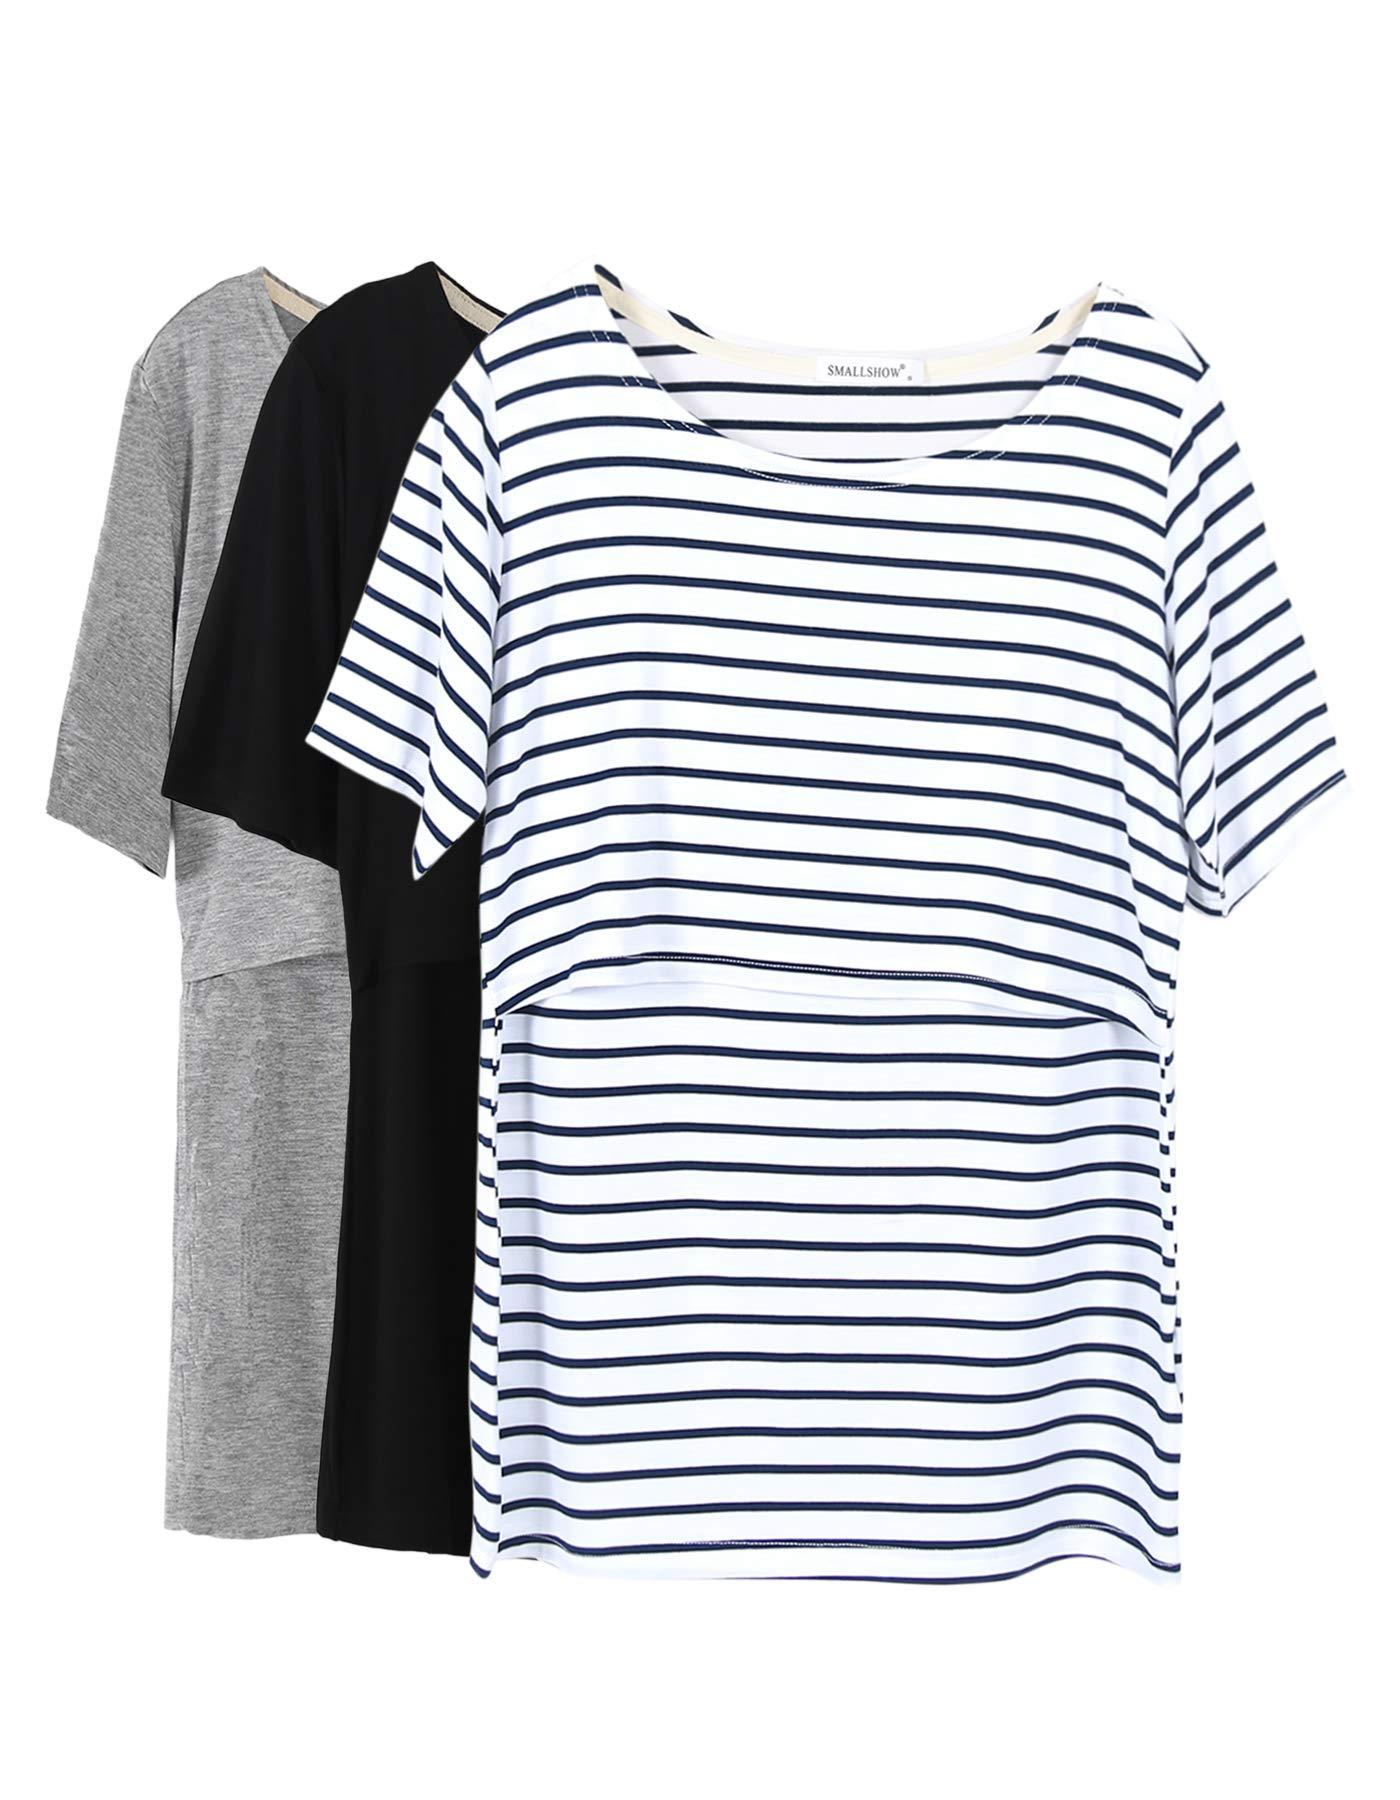 Smallshow 3 Pcs Maternity Nursing T-Shirt Nursing Tops White Stripe-Black-Grey Medium by Smallshow